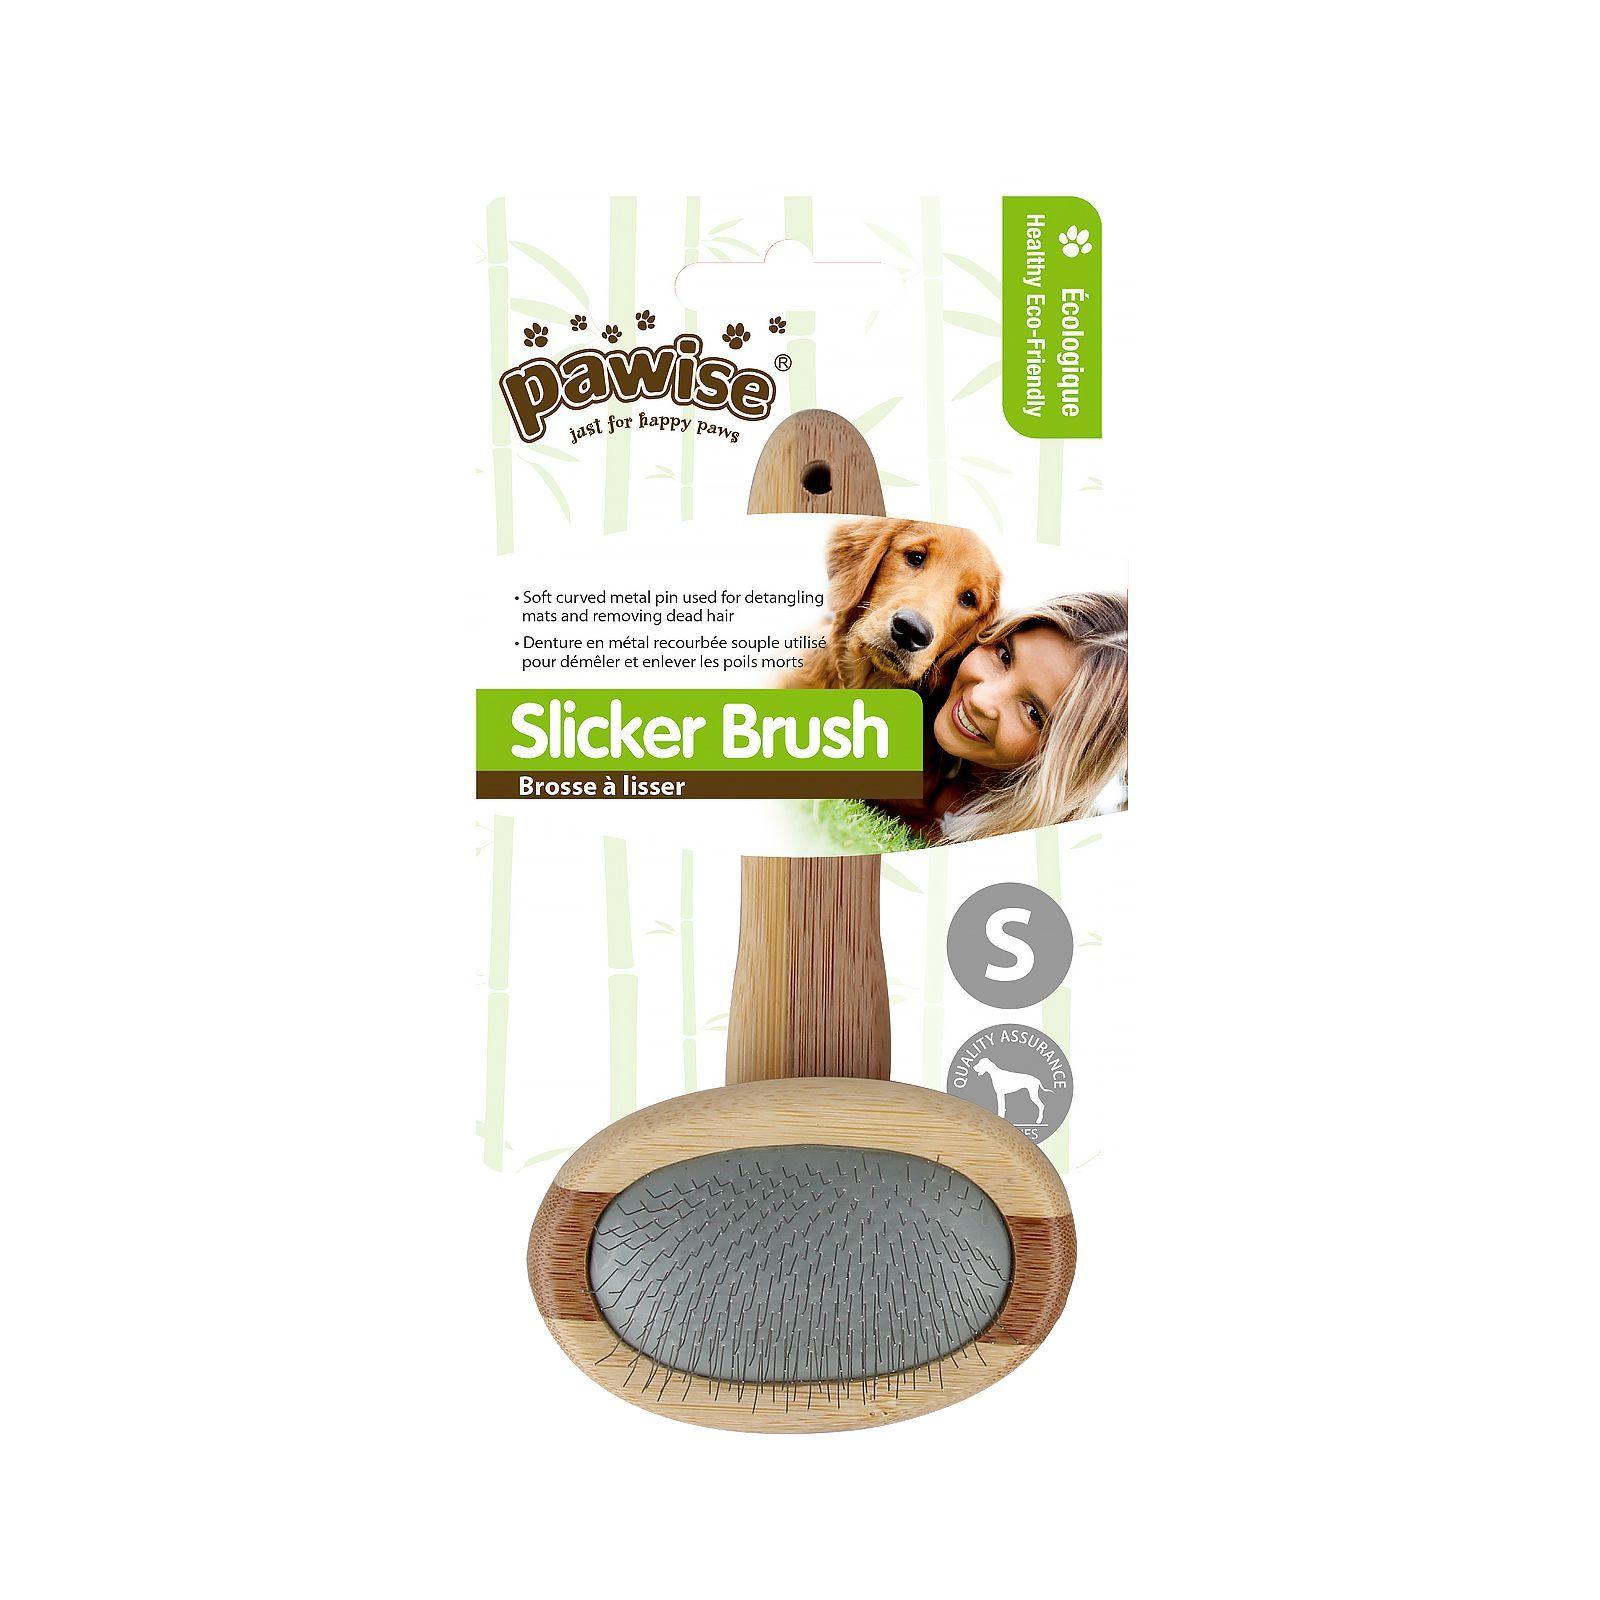 Pawise: Slicker Brush image